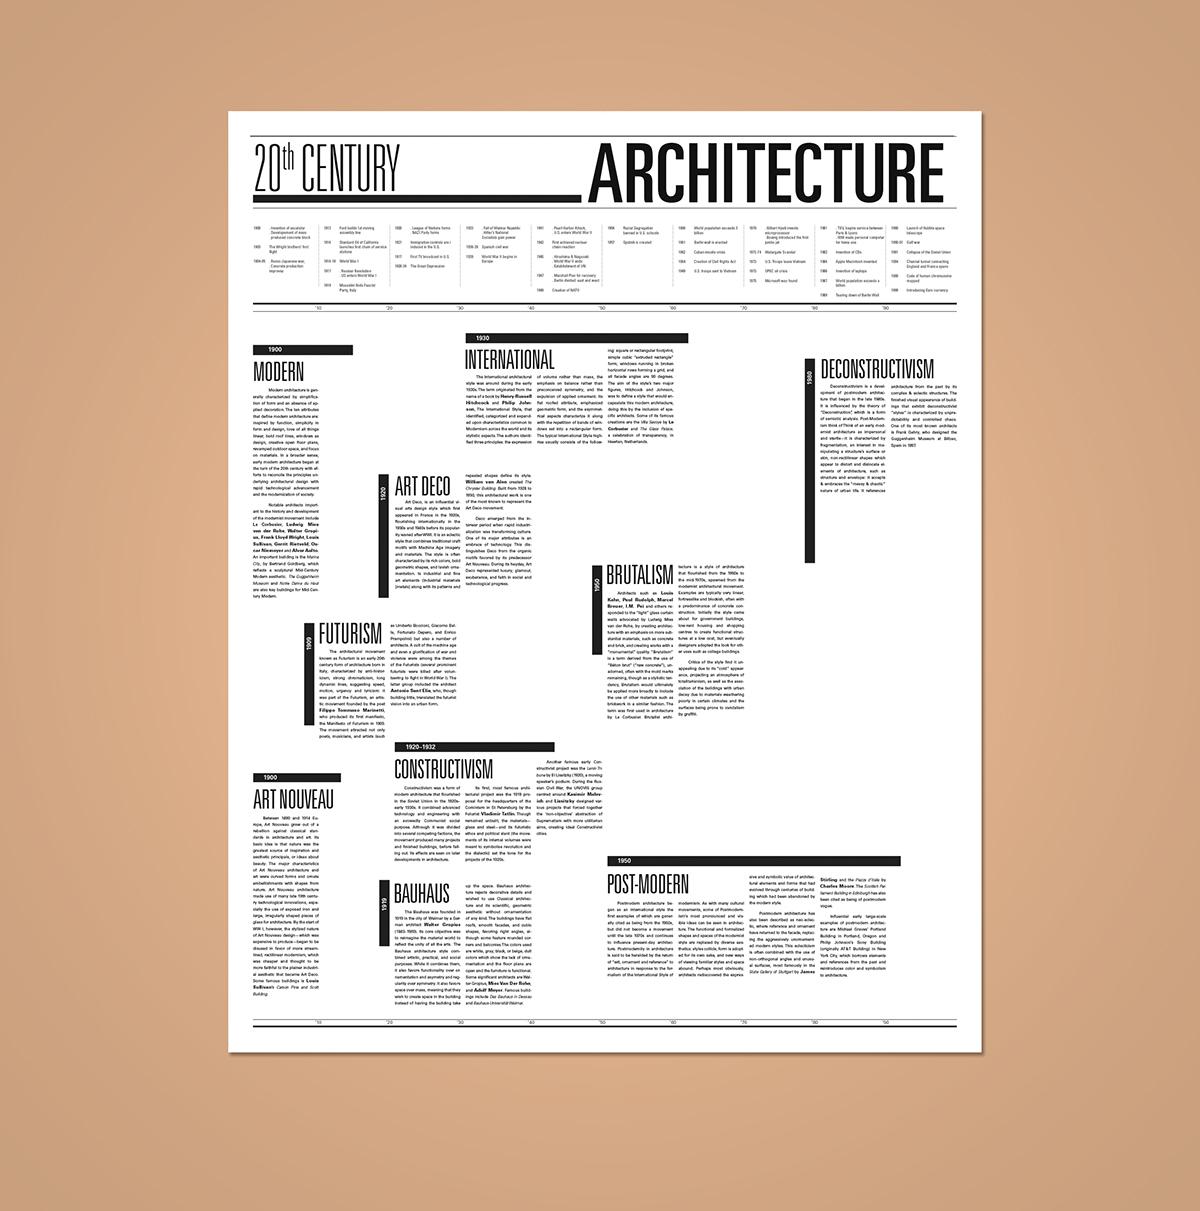 Modern Architecture Timeline 20th century architecture timeline on saic portfolios